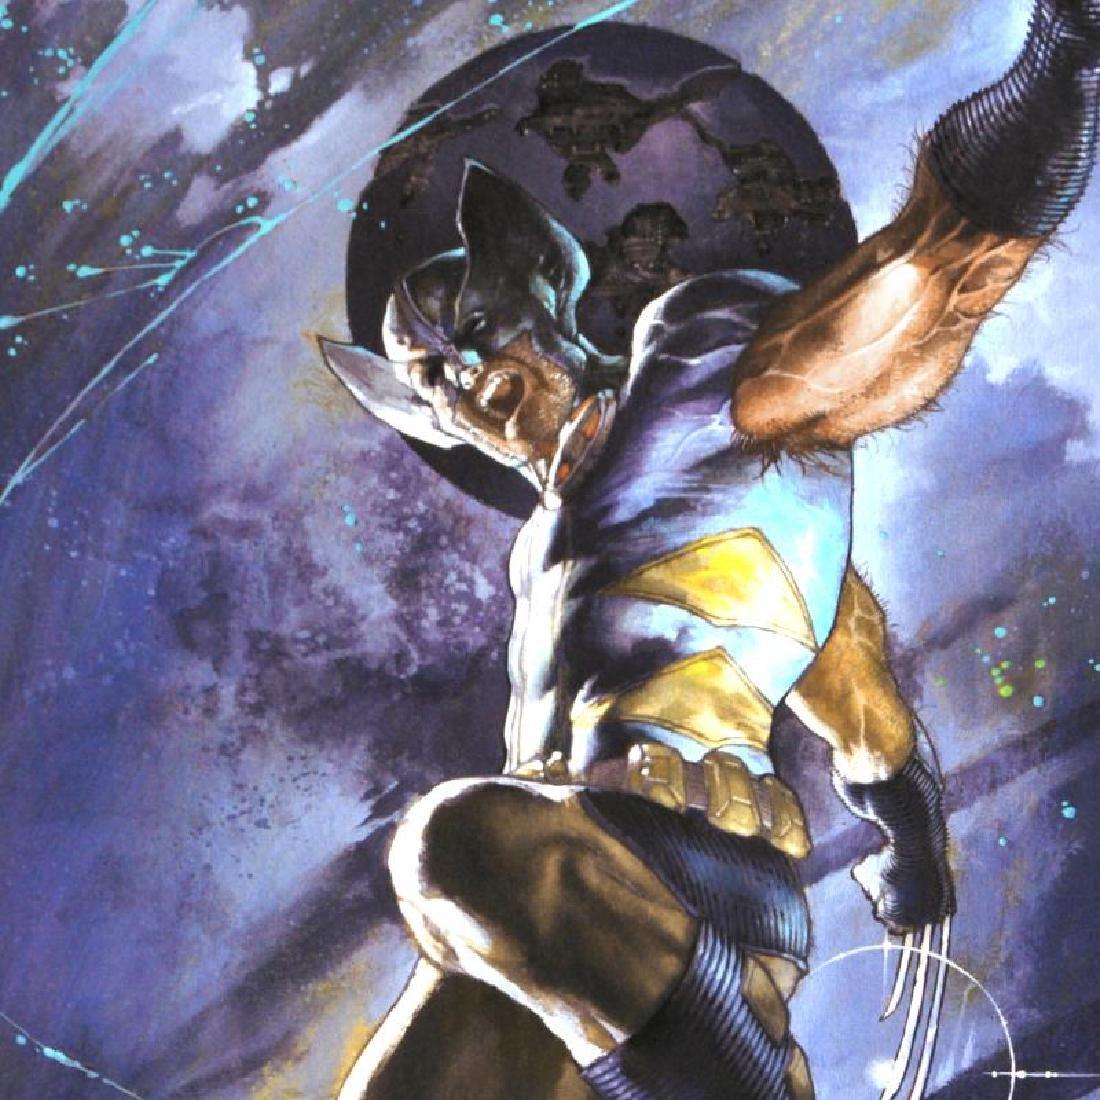 Uncanny X-Men #539 by Marvel Comics - 2